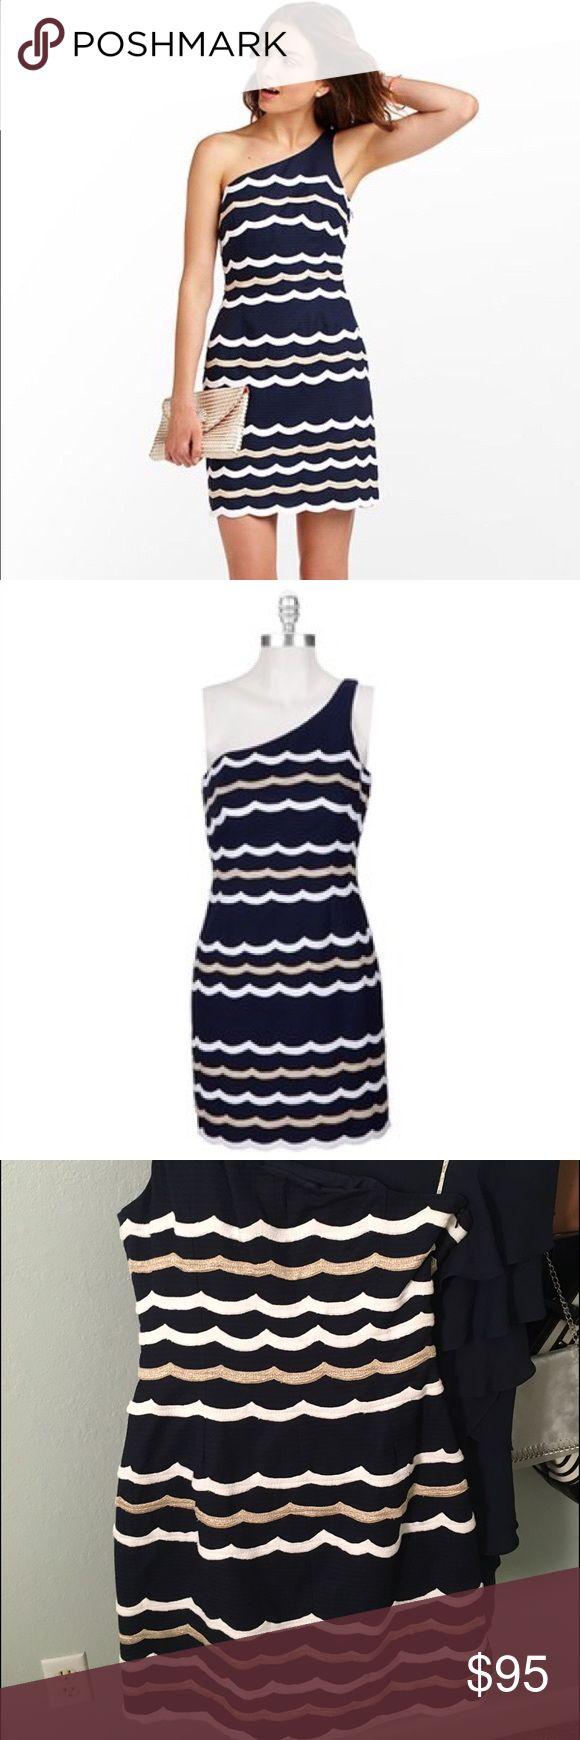 Lilly Pulitzer navy one strap dress Glitter stripe one strap dress Lilly Pulitzer Dresses One Shoulder